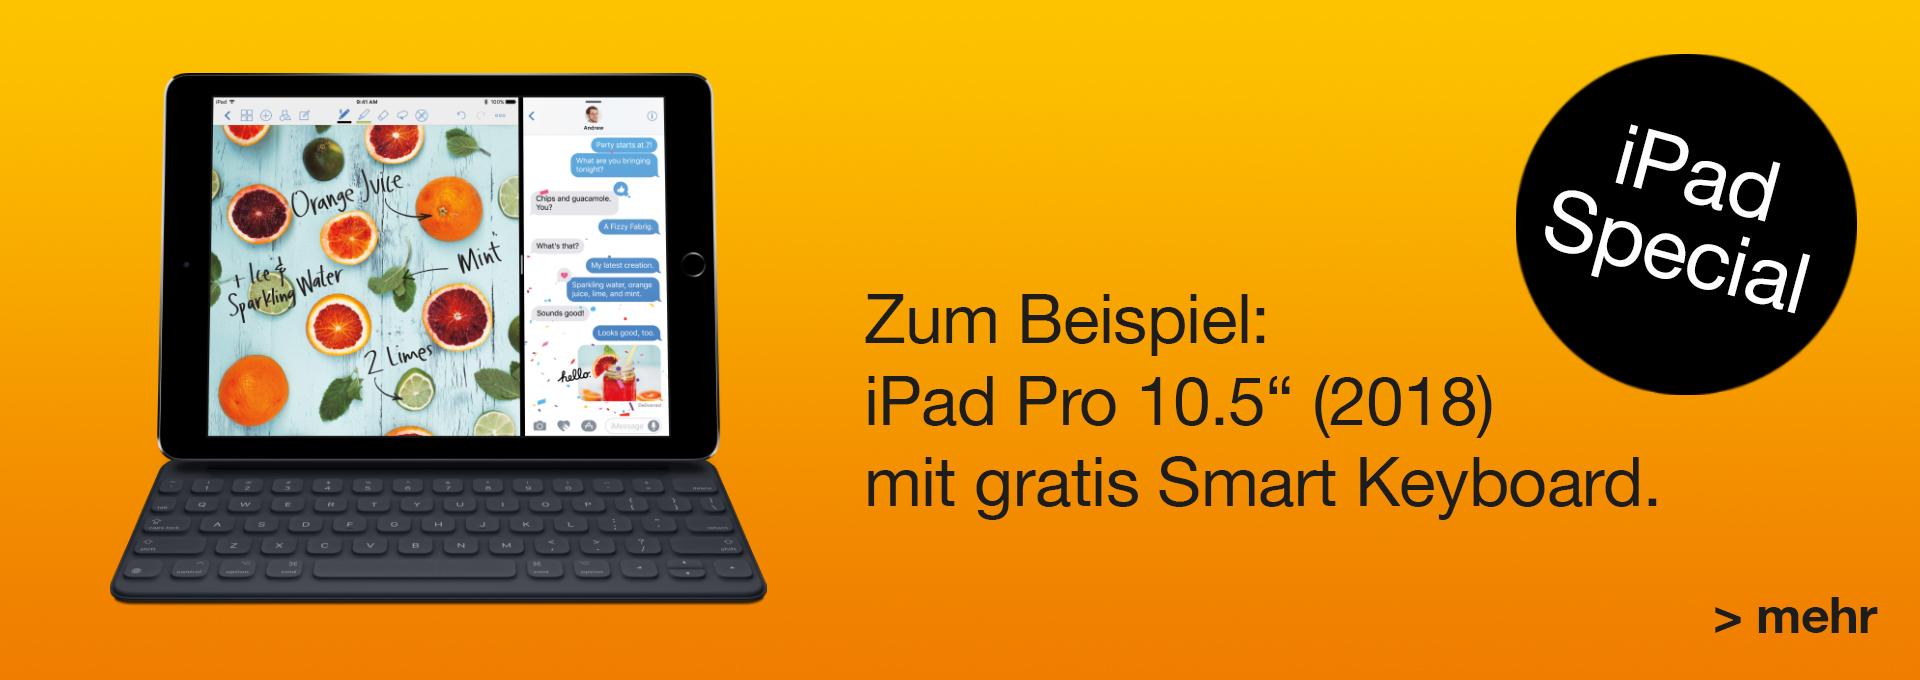 Apple iPad Special Promo